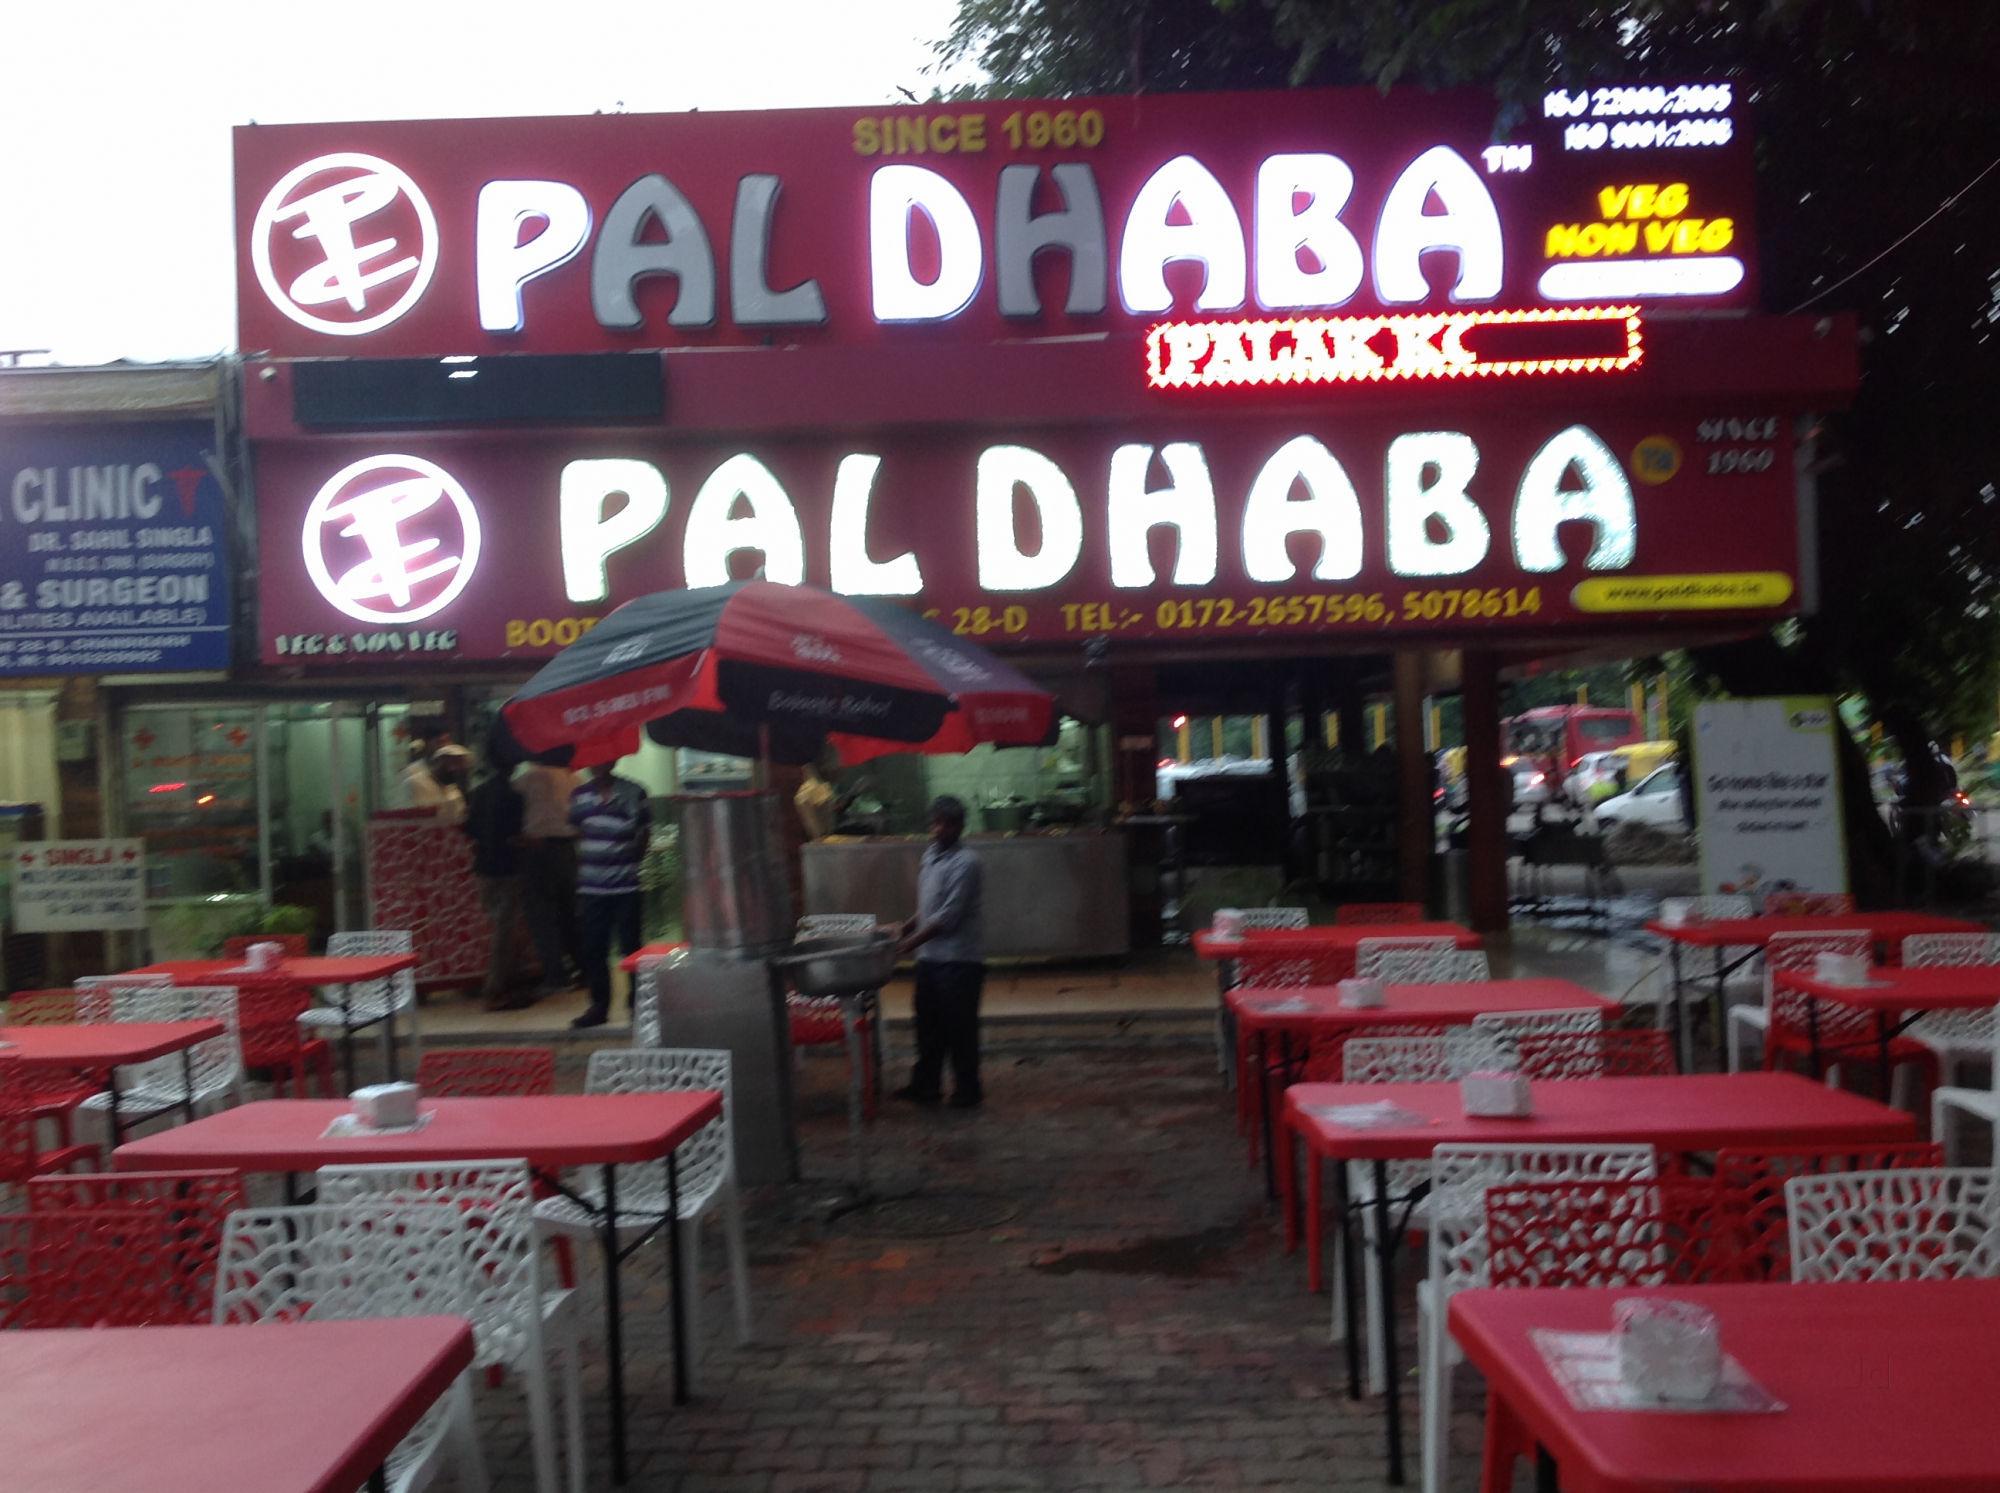 Pal dhaba - the city beautiful Chandigarh